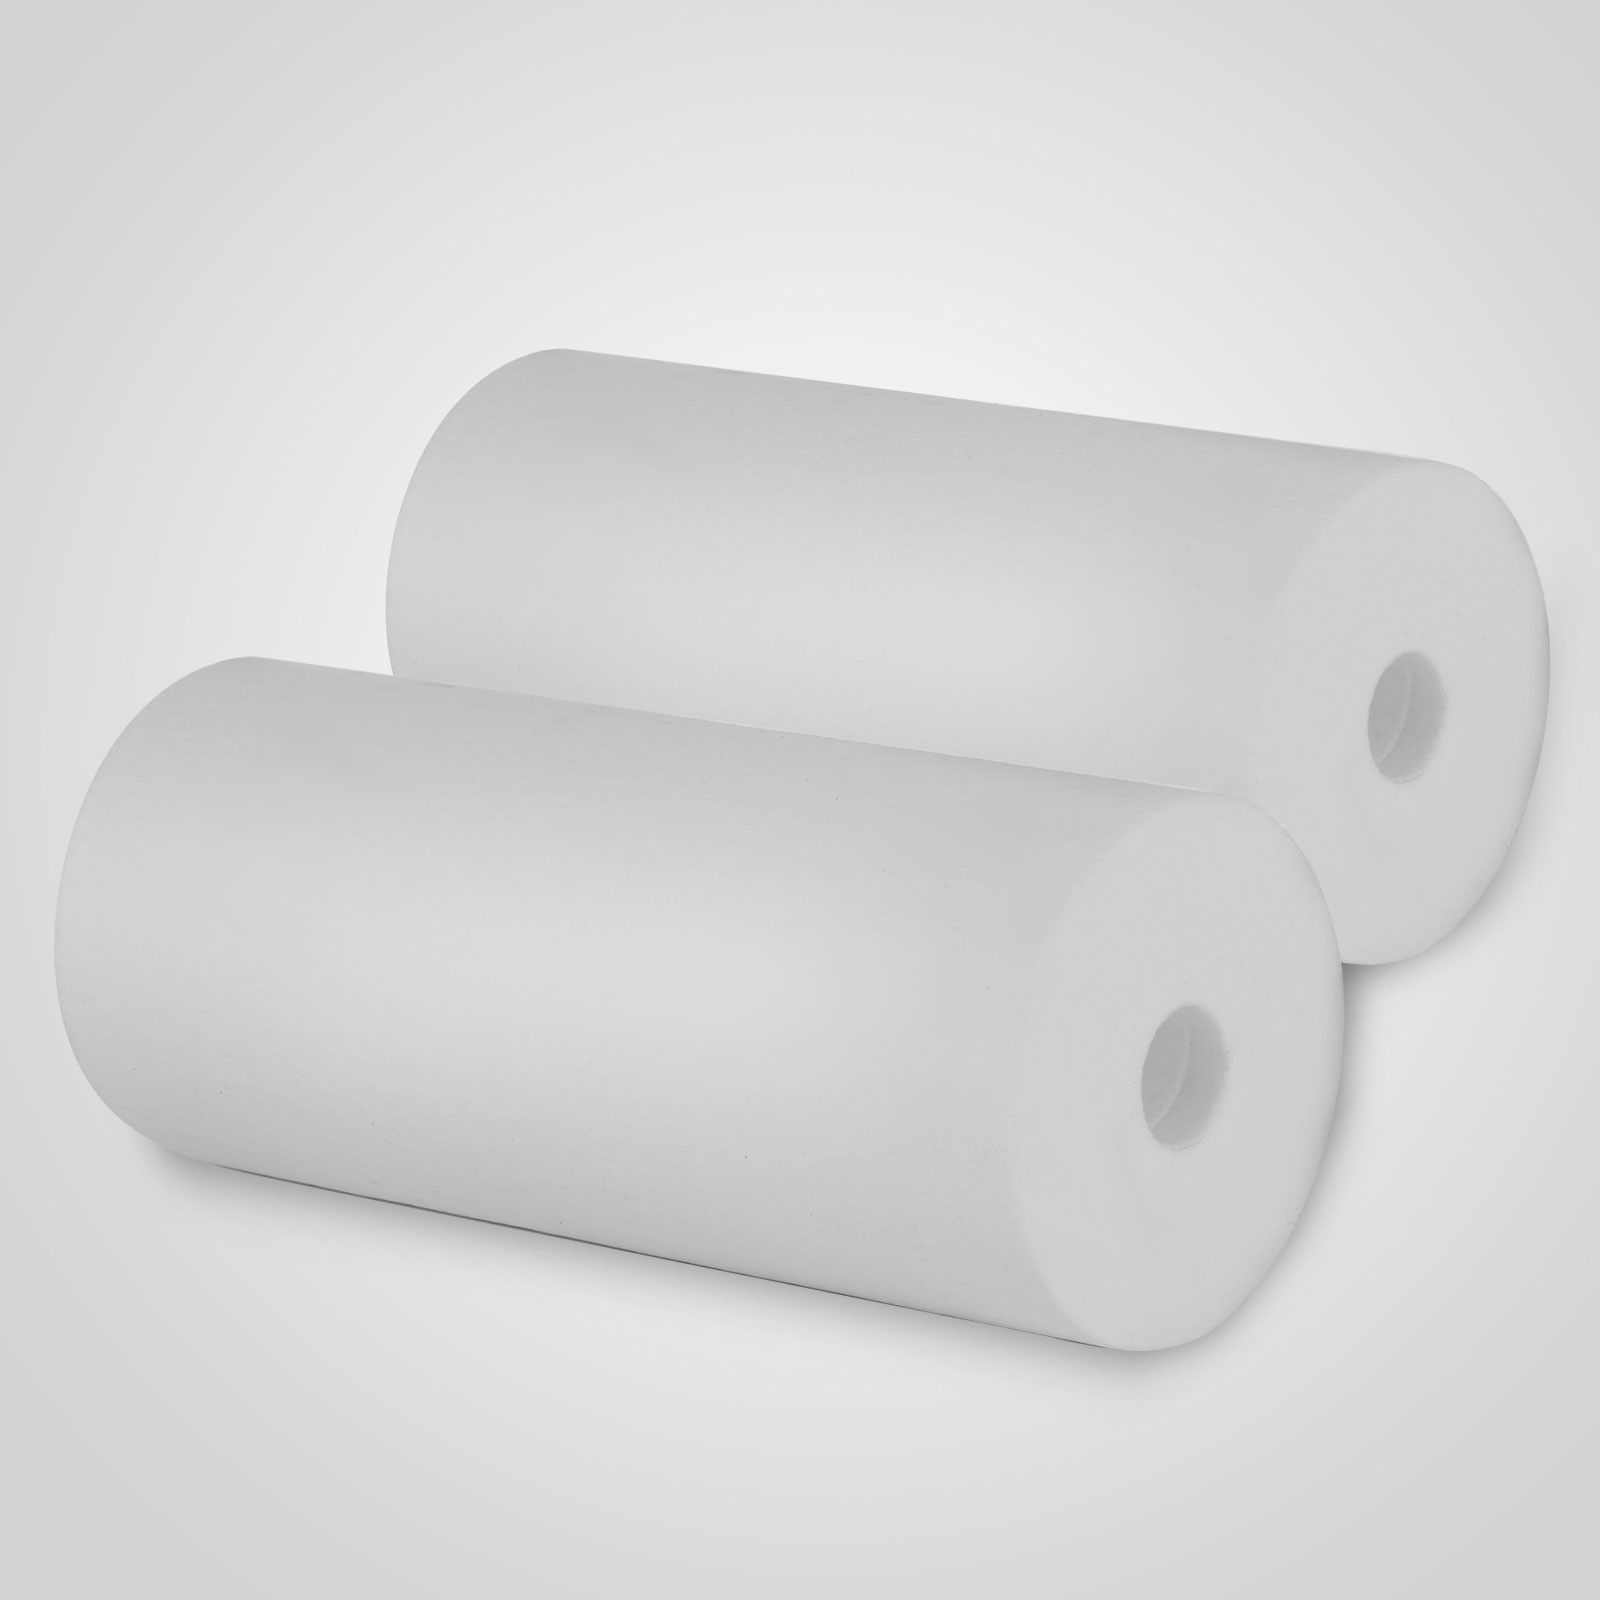 20Pcs-Cartouche-Filtre-a-eau-5-Micron-10-034-X-4-5-034-as-Brita-Bobine-Anti-boue miniature 10